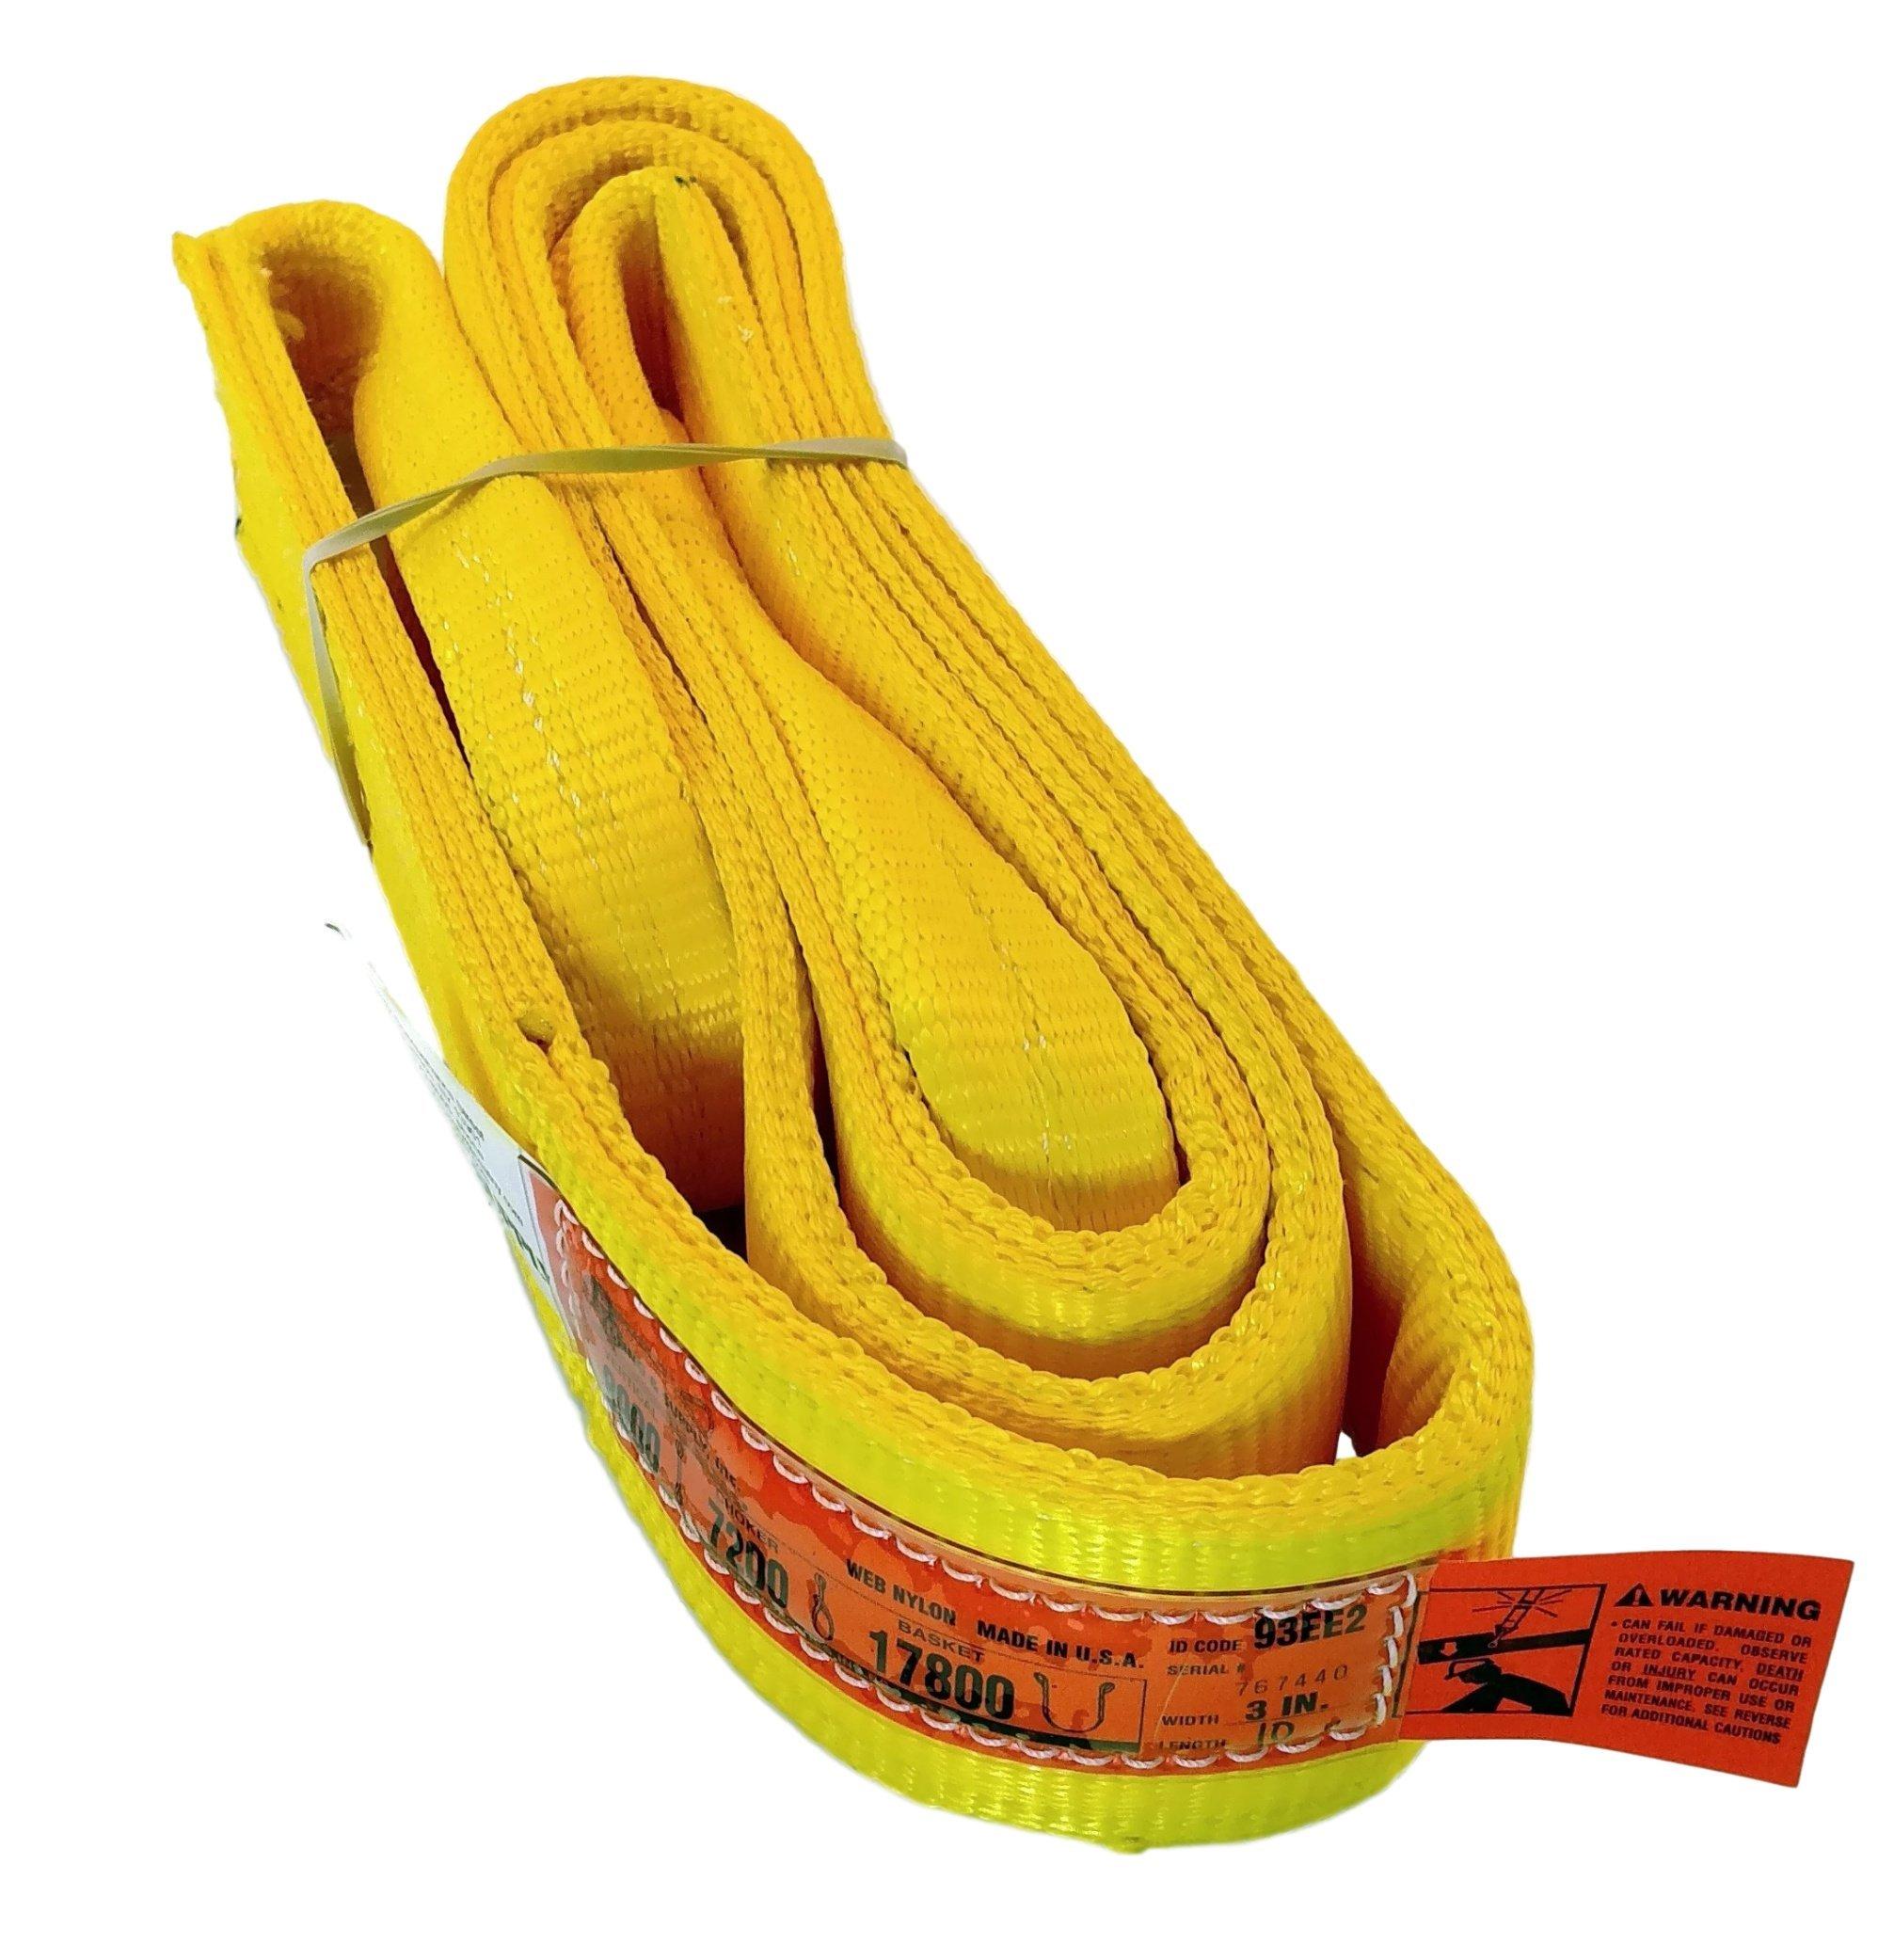 DD Sling (USA Made). 3'' Widths By 6' to 20' Lengths in Listing, 2 Ply Twisted Eye, Nylon Lifting Slings, Eye & Eye, 8,900 lbs Vert, 7,200 lbs Choker, 17,800 lbs Basket Load Capacity (3'' x 10')